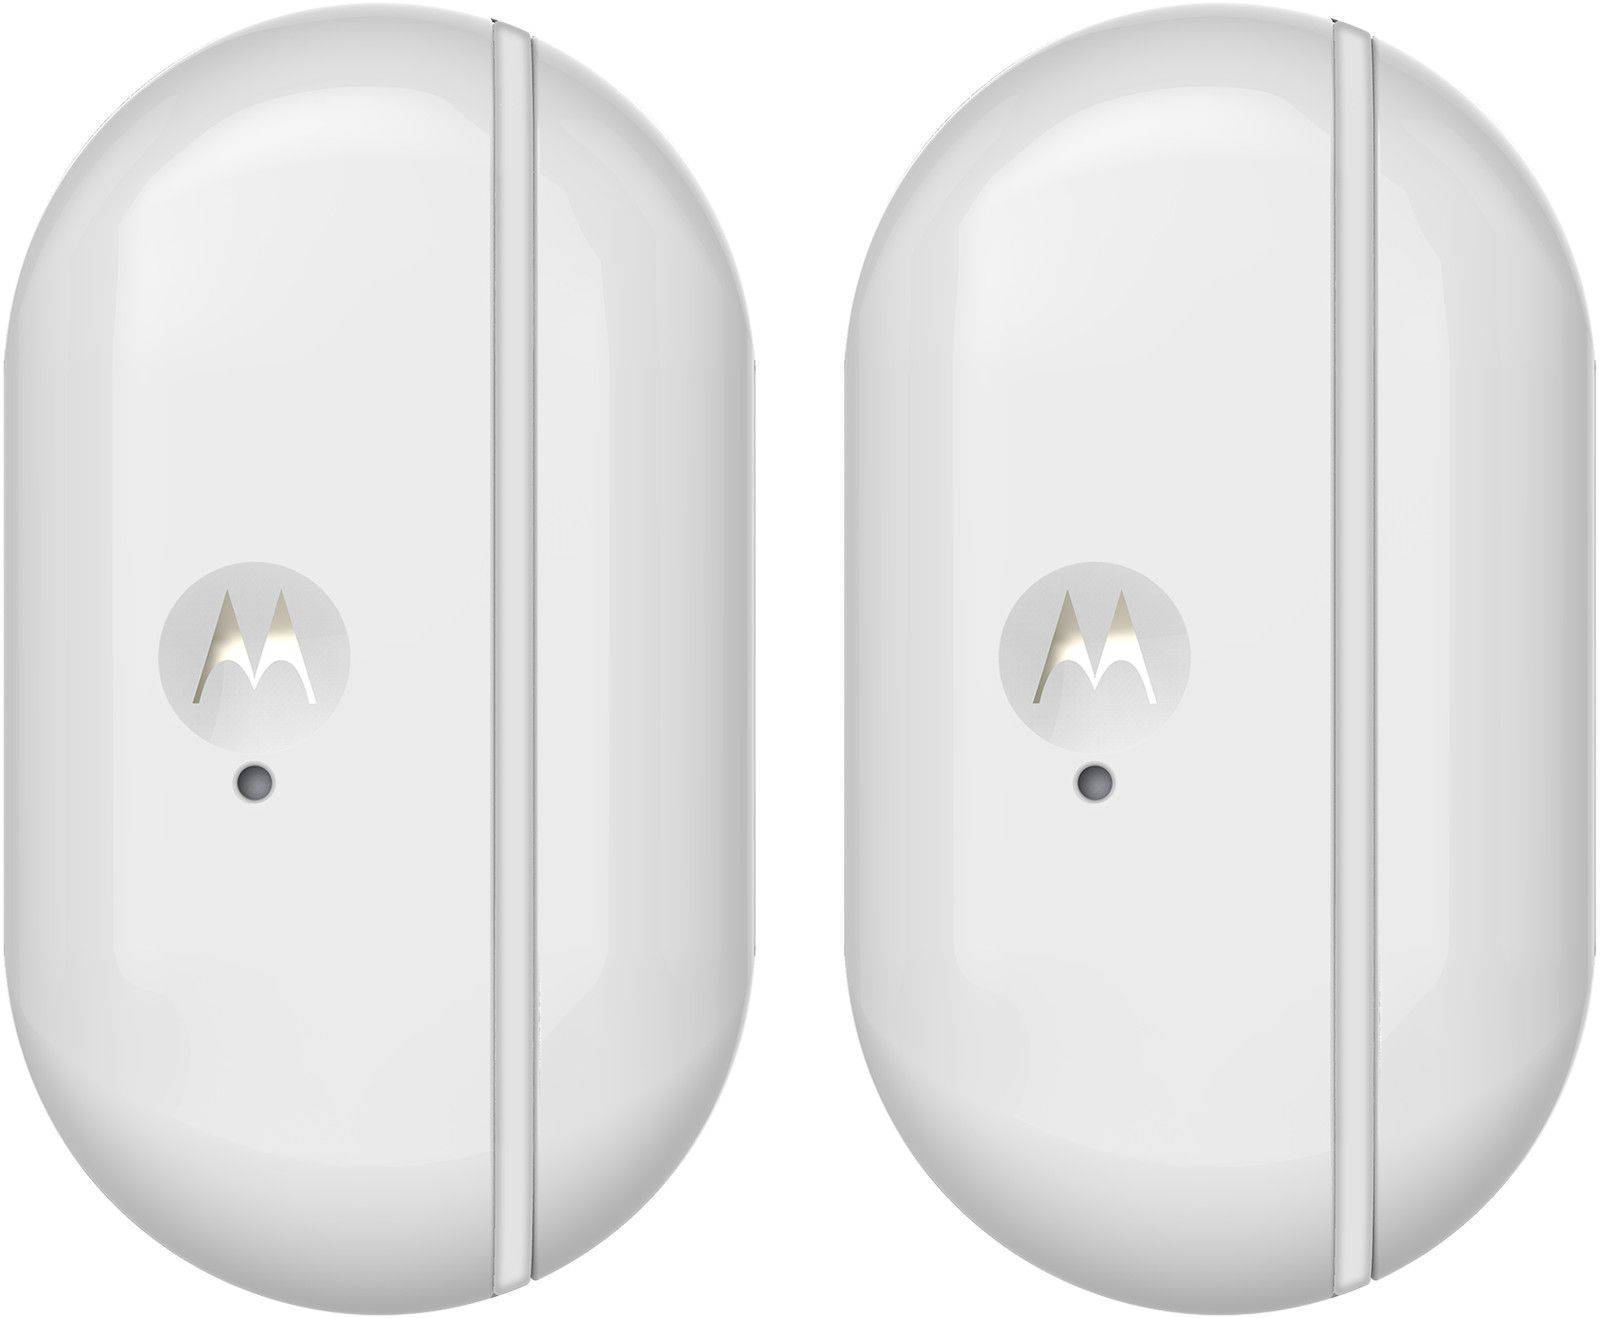 Motorola Smart Nursery Sensor MBP81 Duo